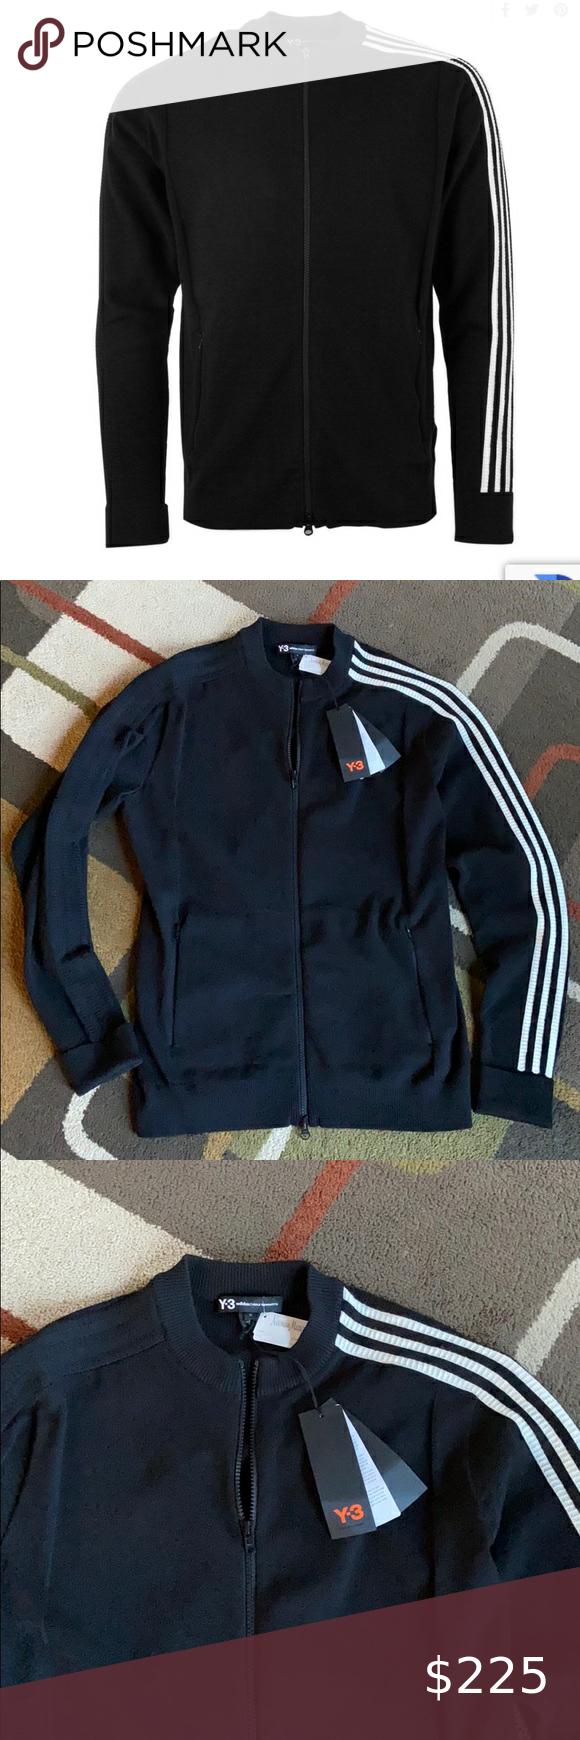 Men S Nwt Yohji Yamamoto Adidas Y 3 Track Jacket Adidas Track Jacket Track Jackets Knit Jacket